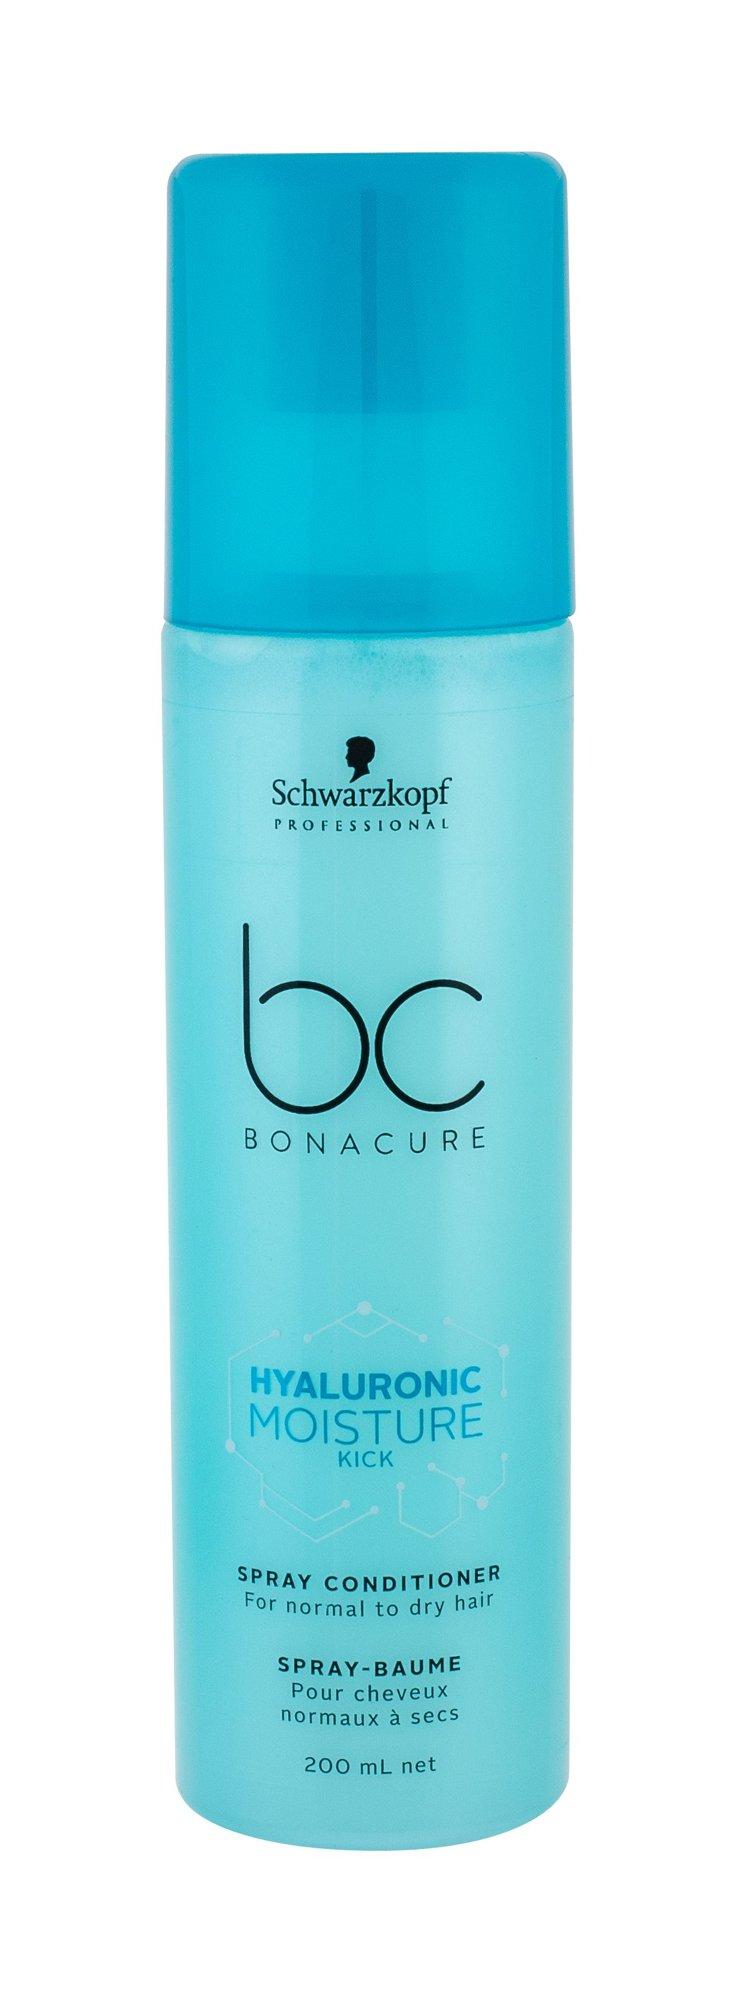 Schwarzkopf BC Bonacure Hyaluronic Moisture Kick Conditioner 200ml